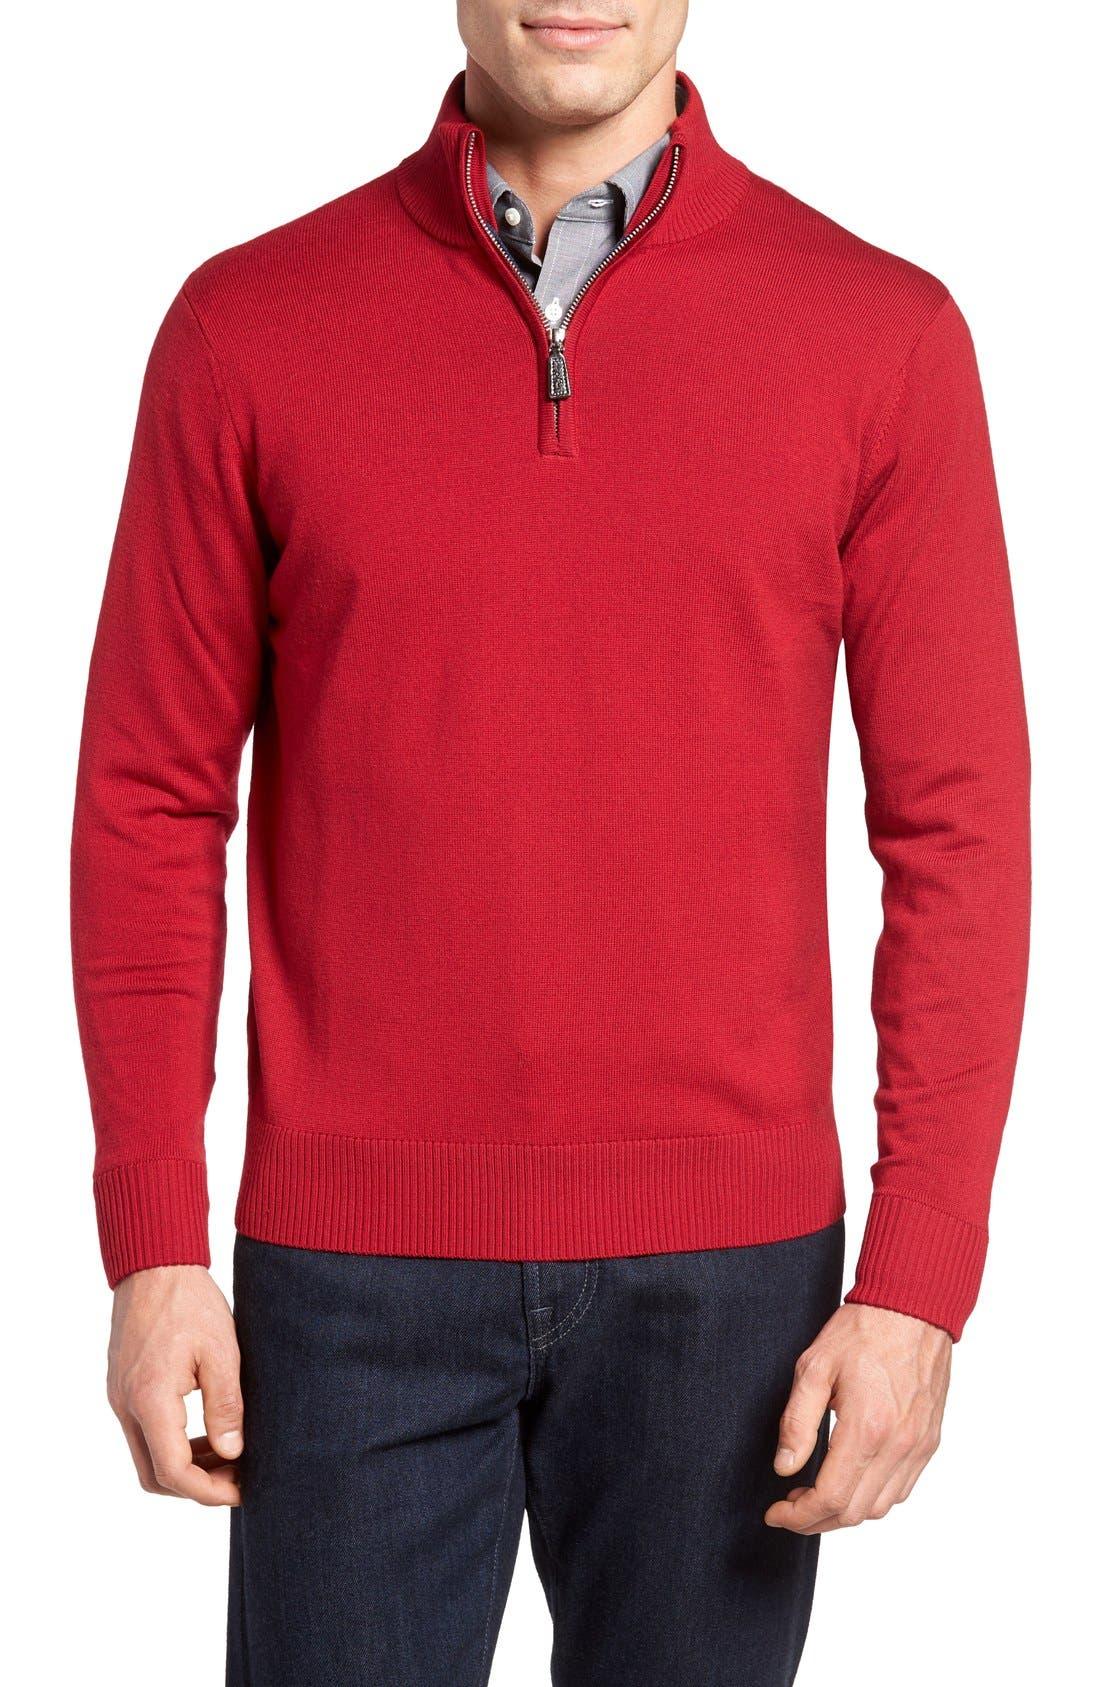 TailorByrd Old Sun Quarter Zip Sweater (Big & Tall)